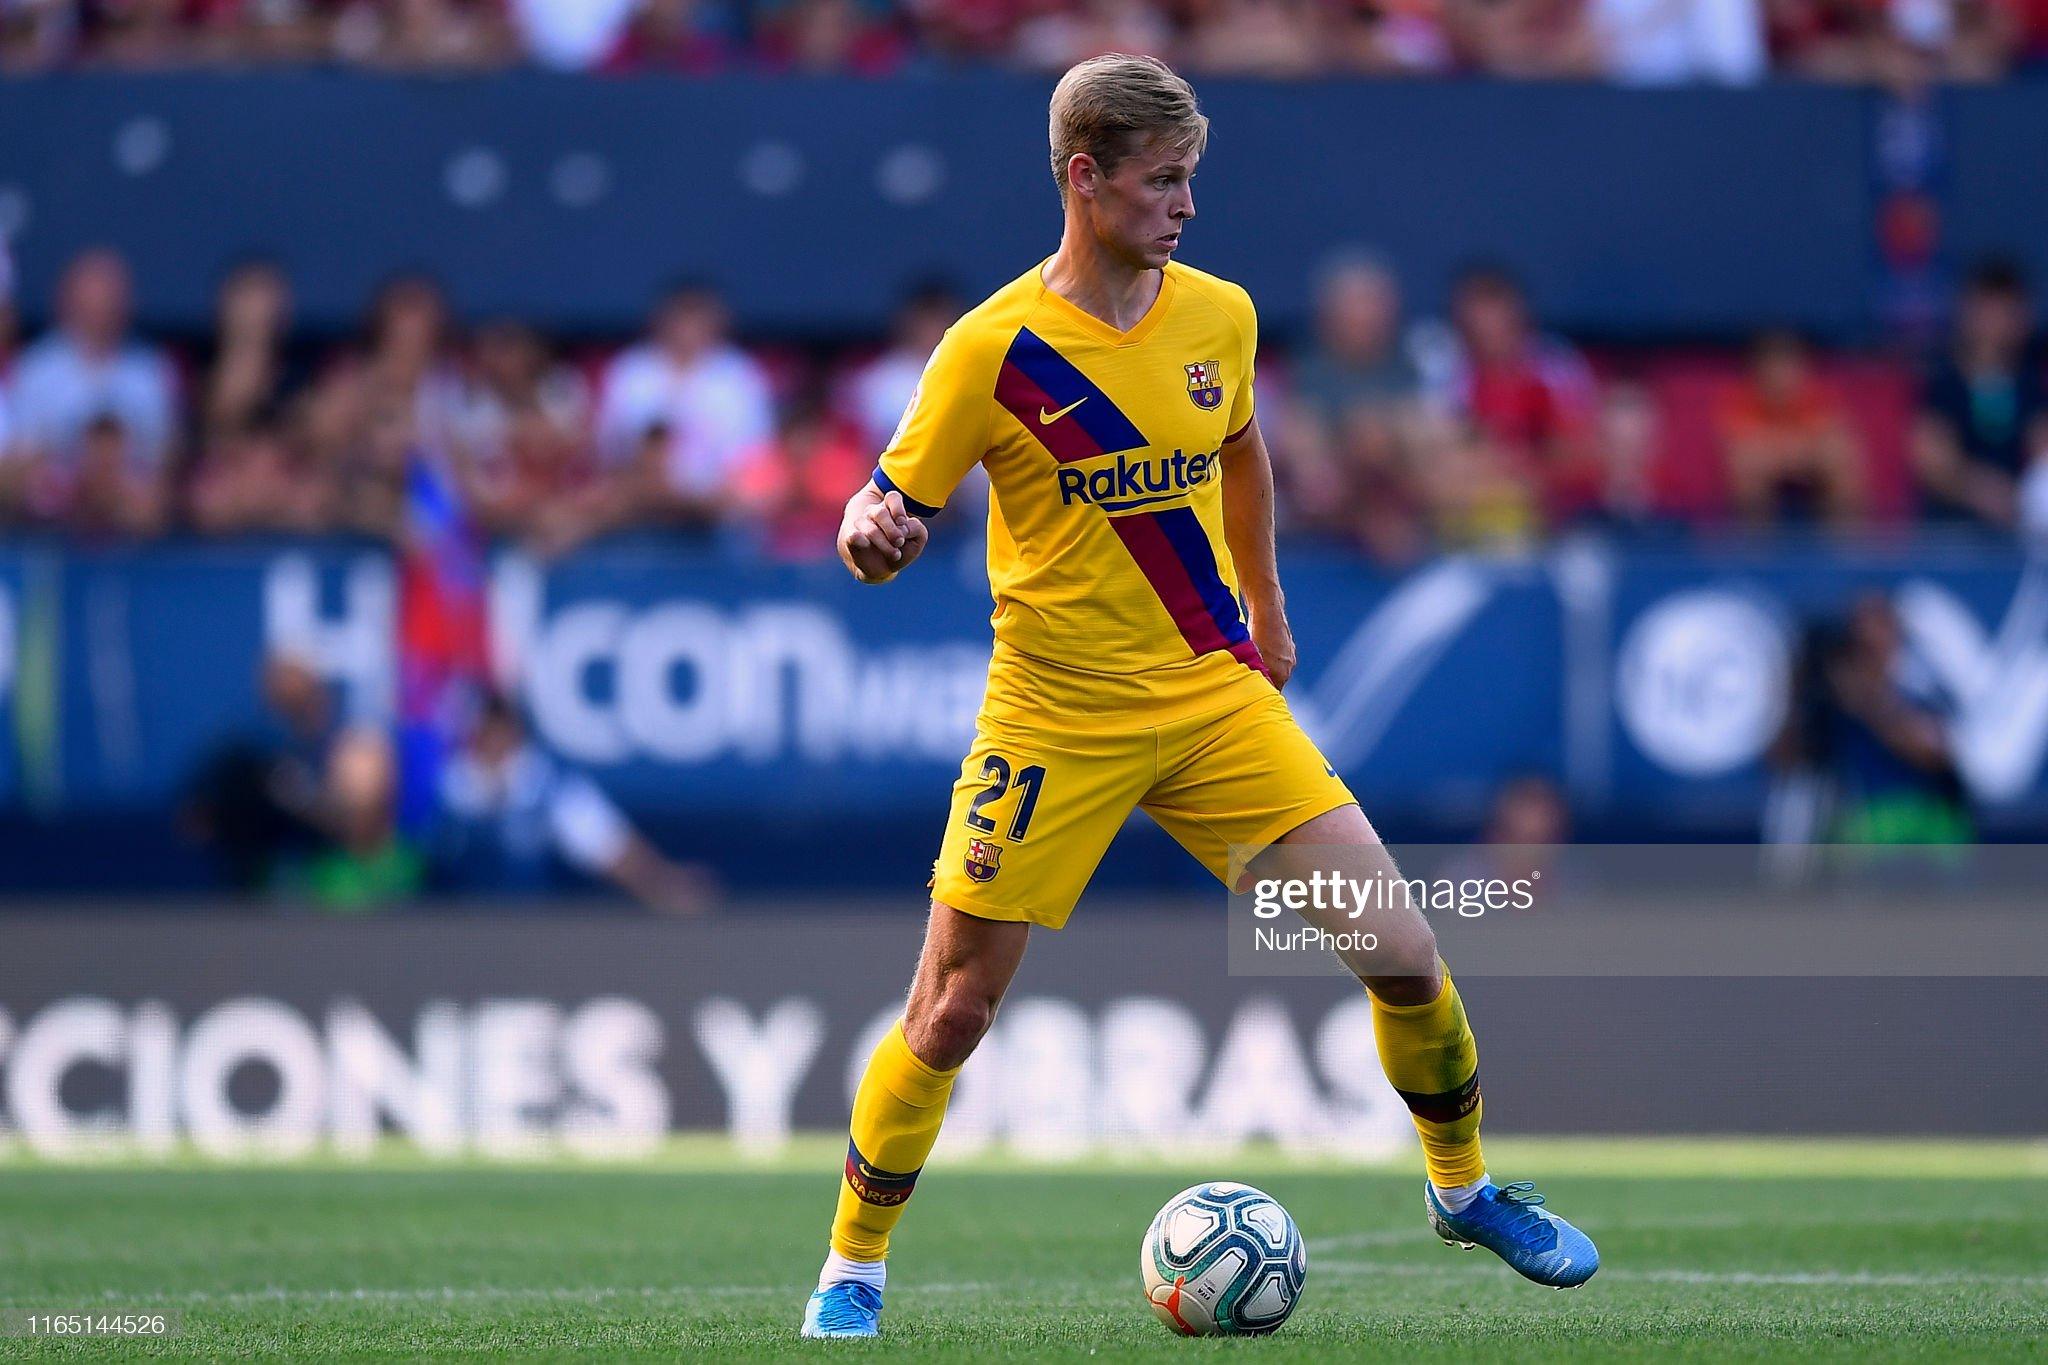 صور مباراة : أوساسونا - برشلونة 2-2 ( 31-08-2019 )  Frenkie-de-jong-of-barcelona-controls-the-ball-during-the-liga-match-picture-id1165144526?s=2048x2048